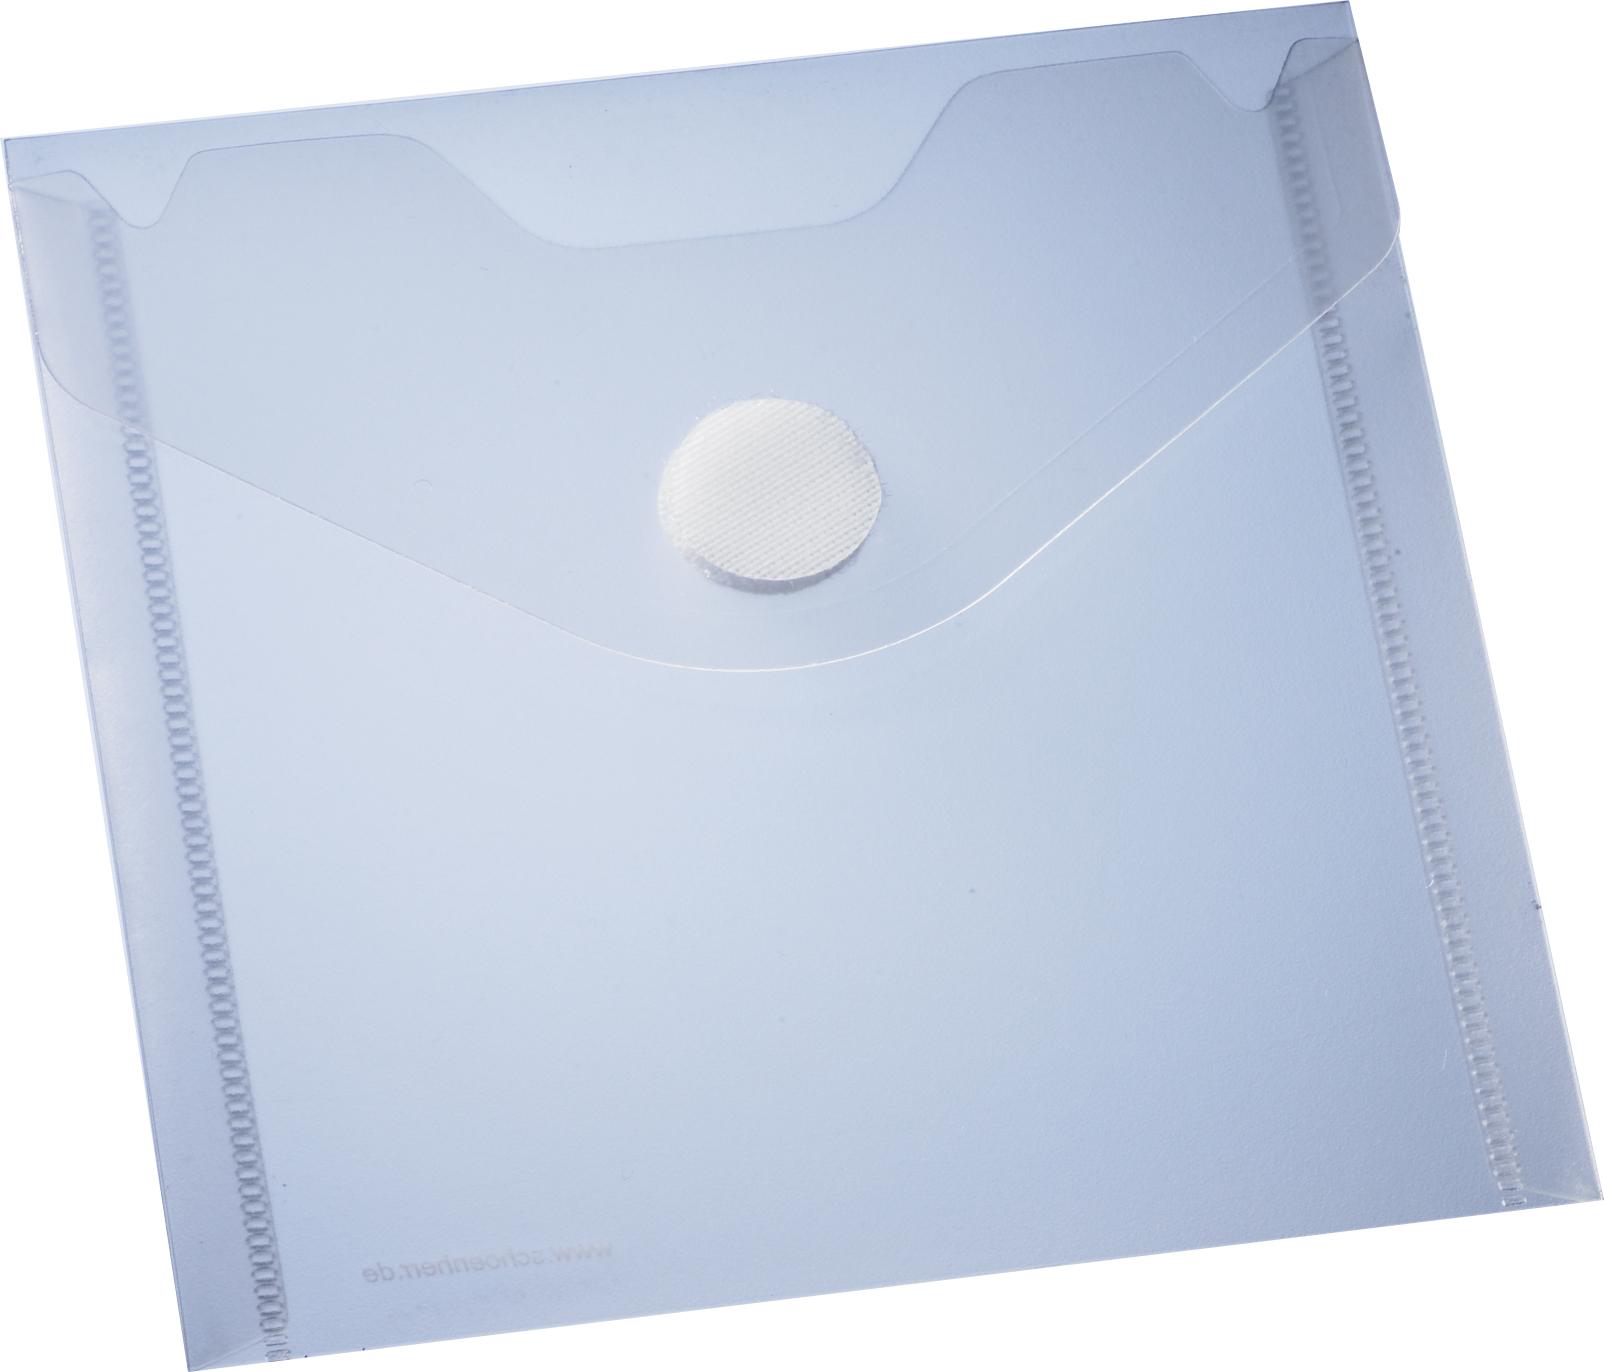 10 selbstklebende matt-transparente CD/DVD-Schutzhüllen mit Klettverschluss